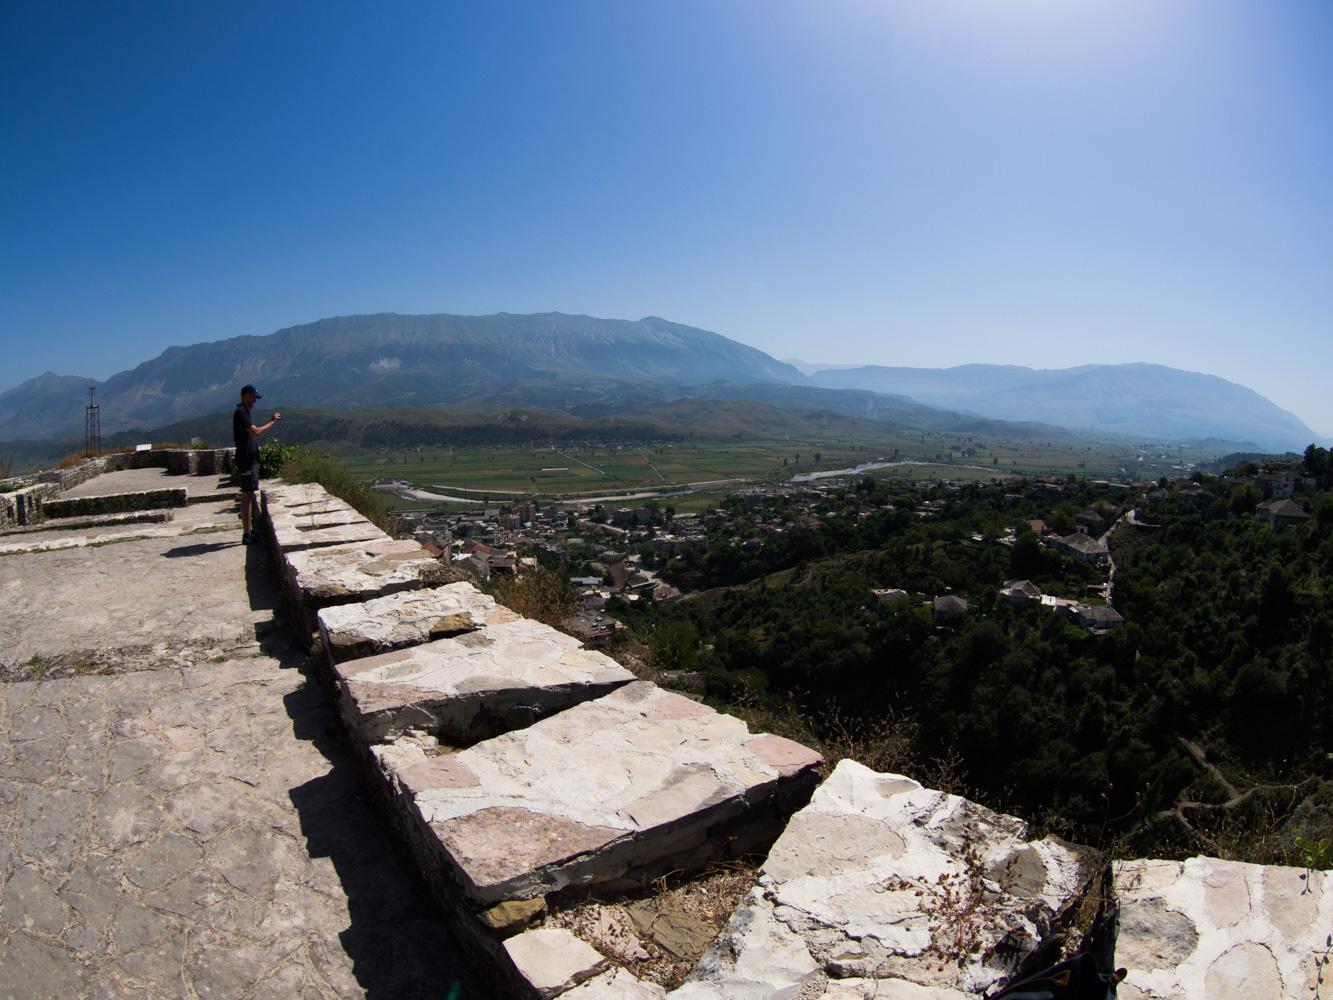 albania_gijrokaster-1-of-1-11